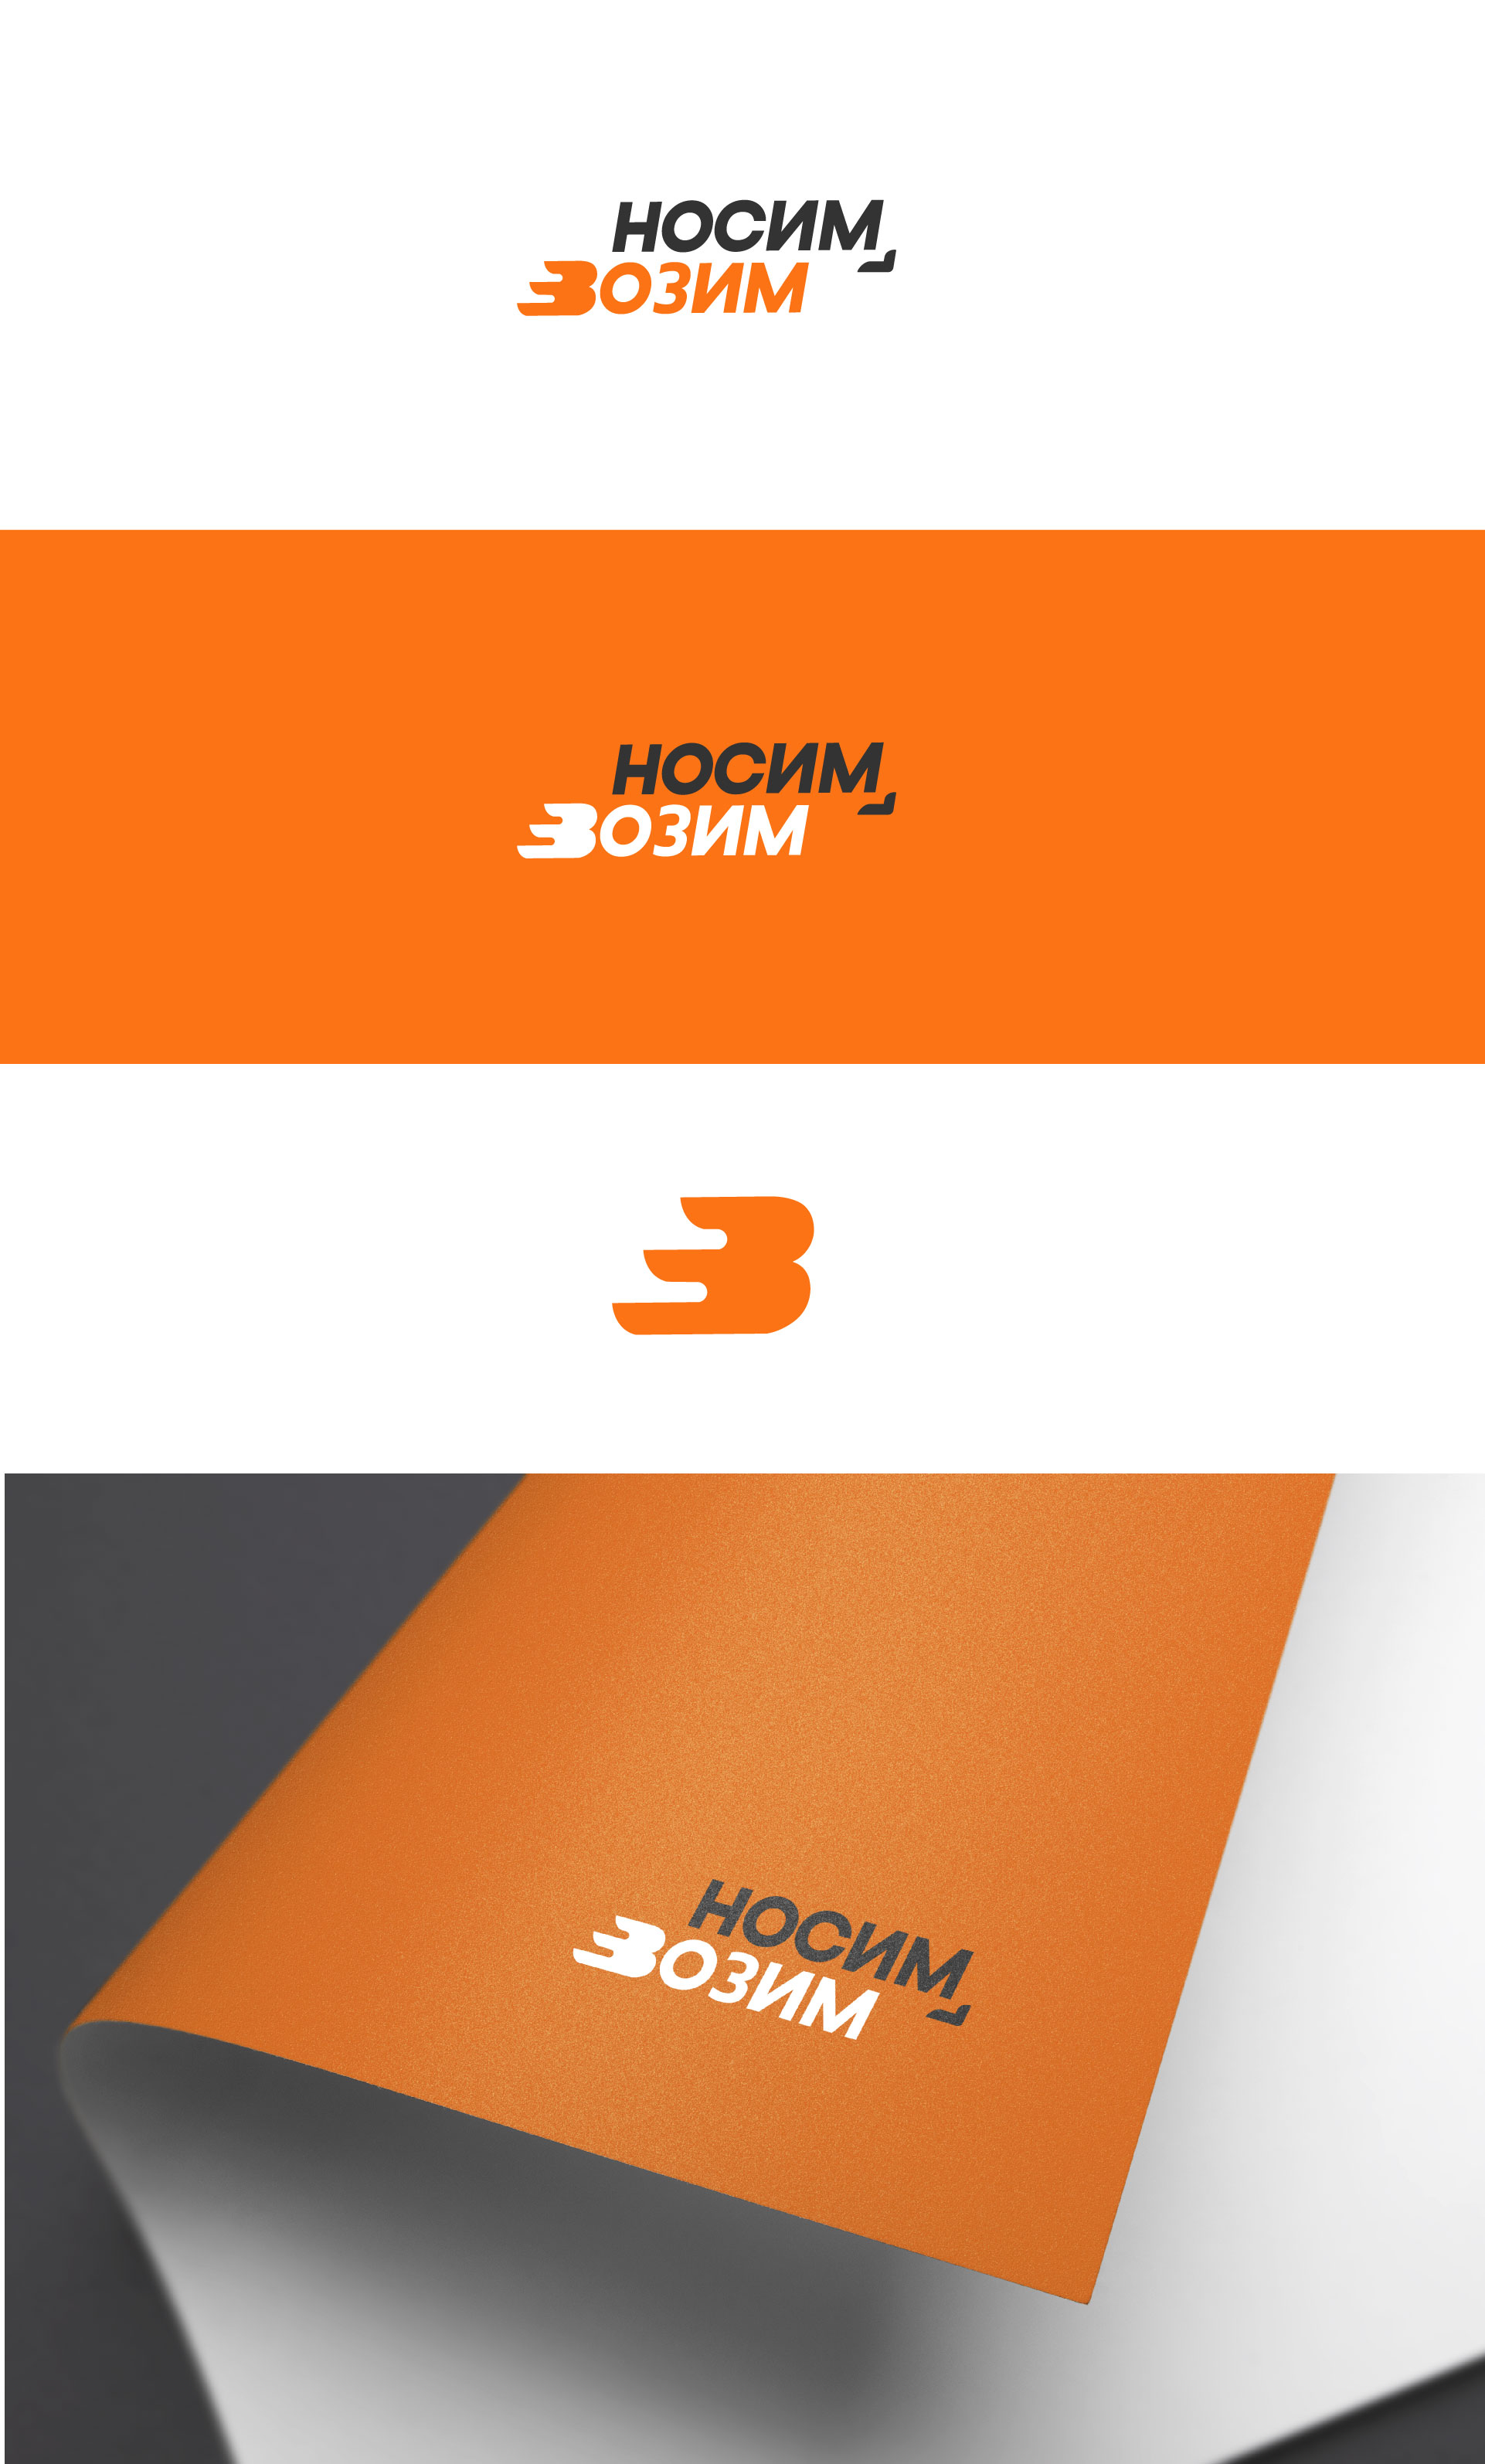 Логотип компании по перевозкам НосимВозим фото f_0595cf9743ce3fb8.jpg